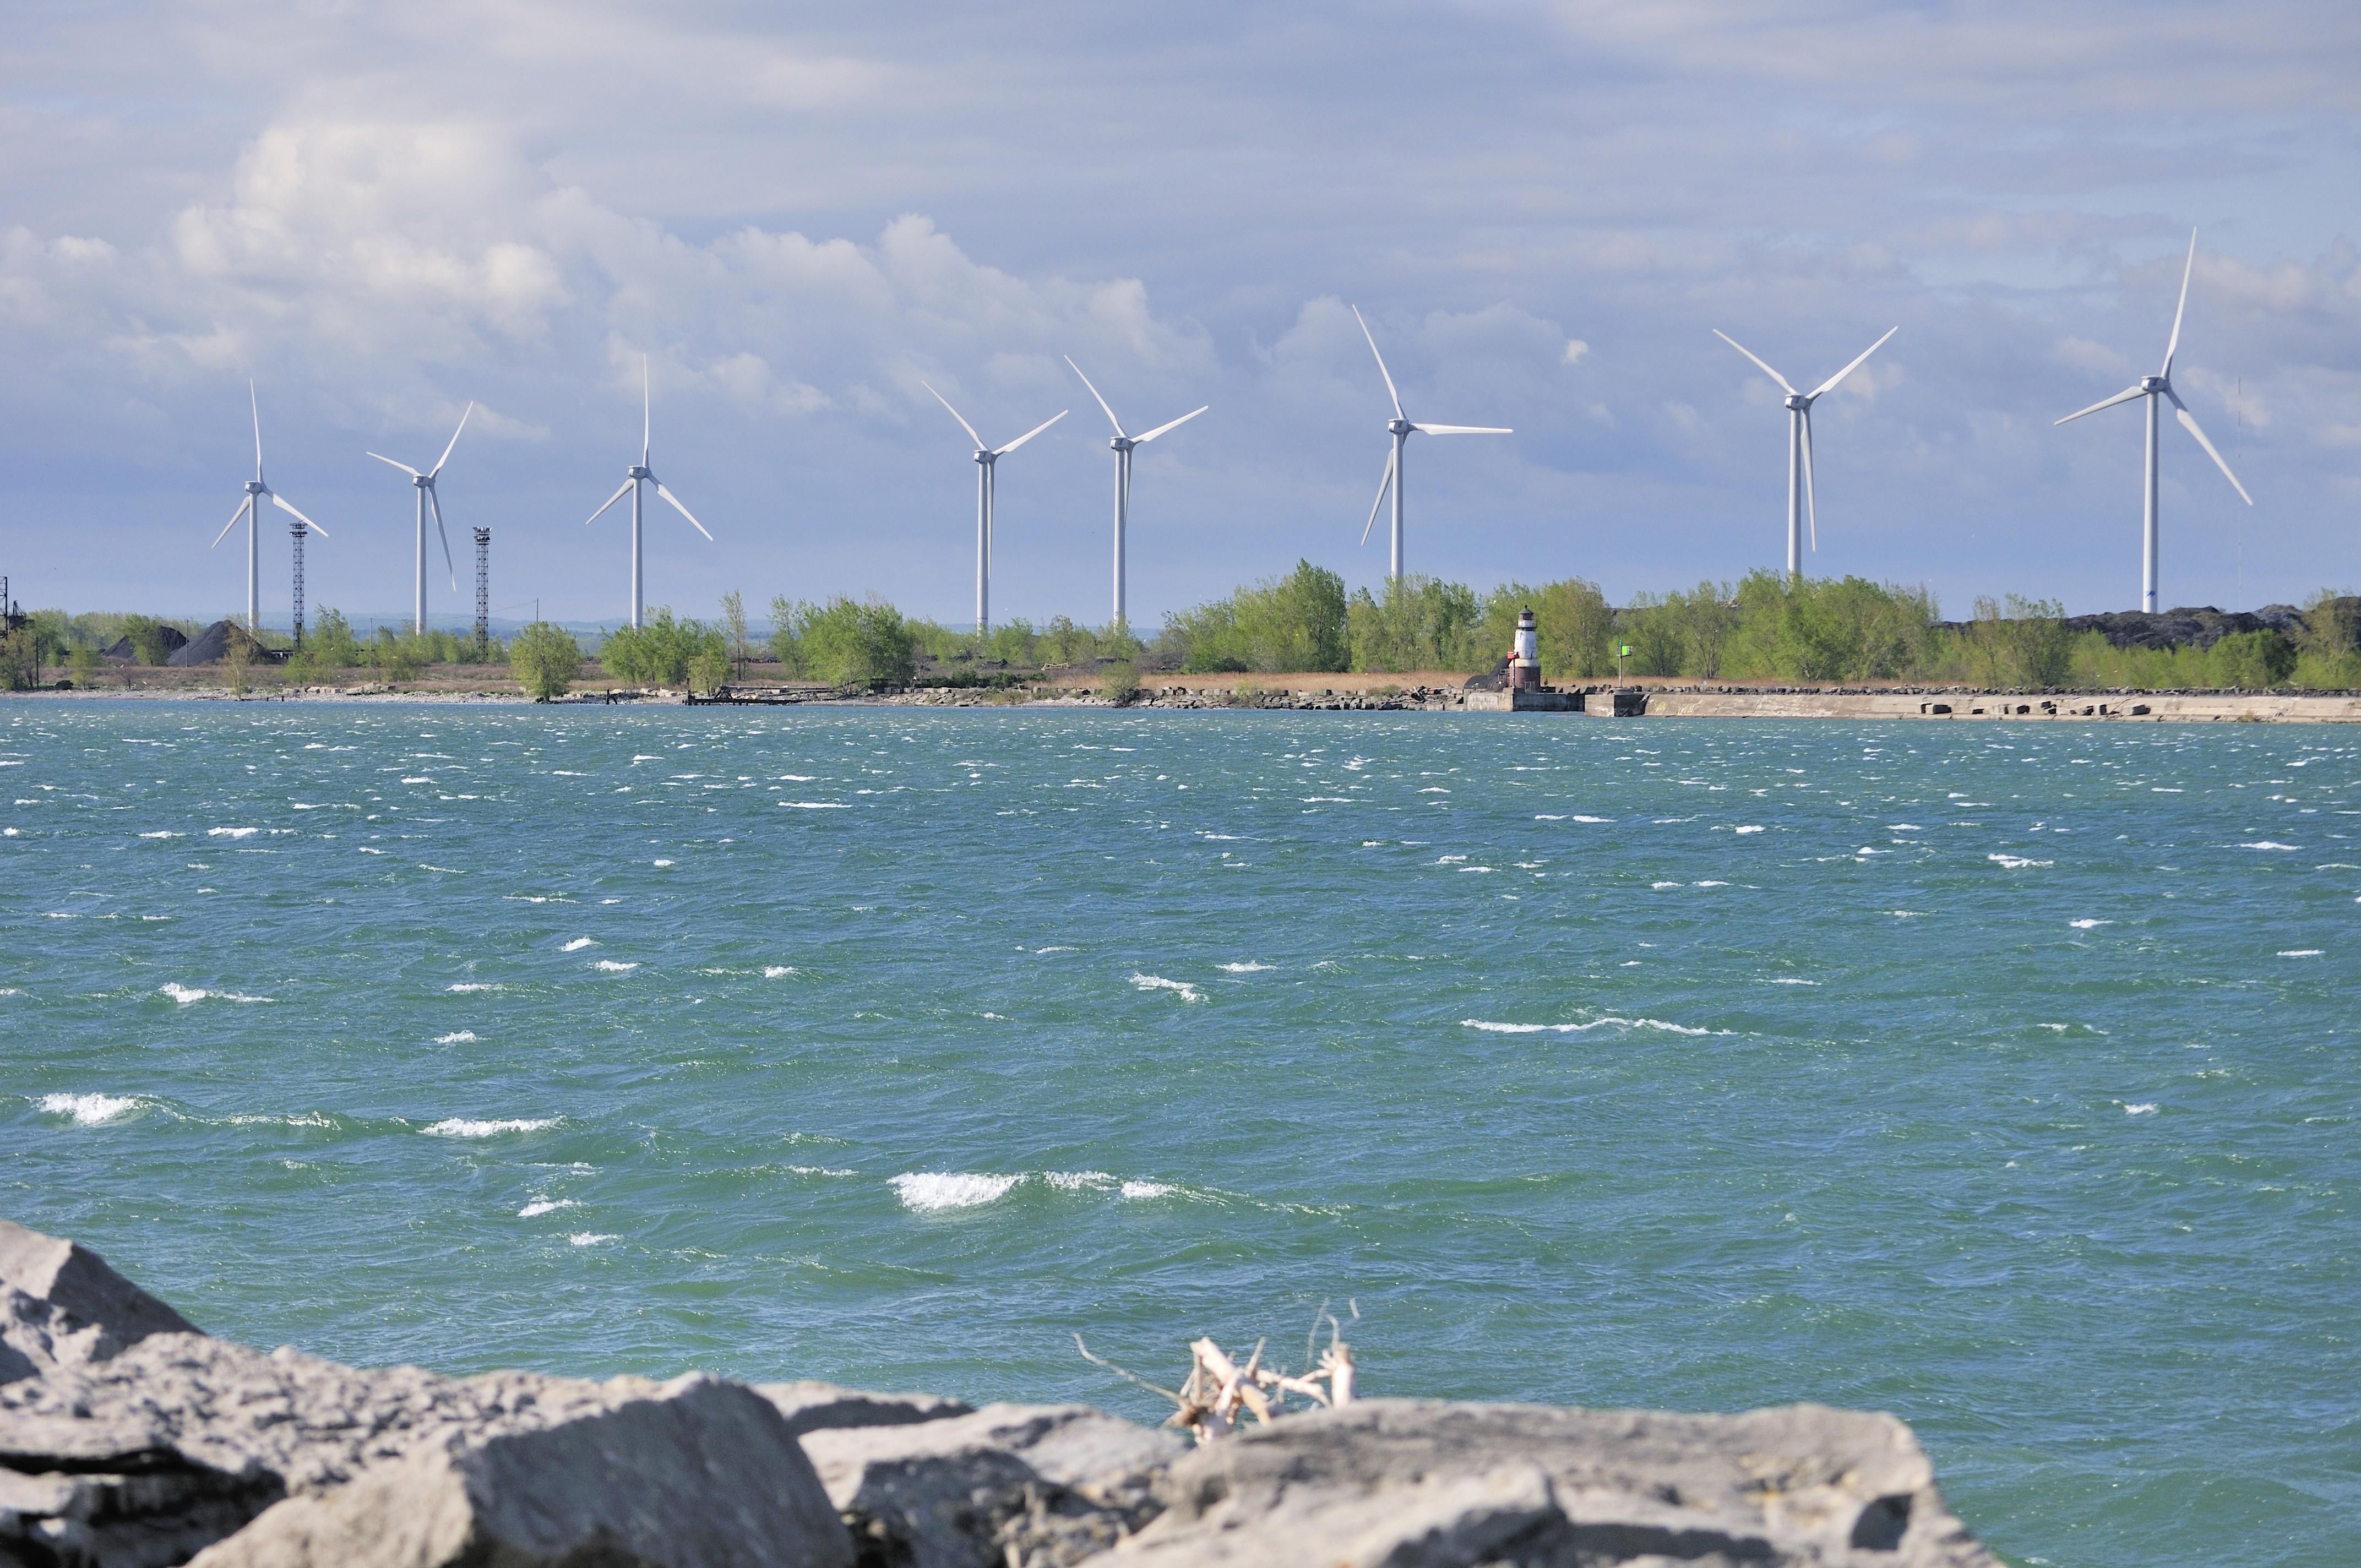 Windmills along the Lake Erie shoreline near Buffalo, New York. (Bruce MacQueen/Shutterstock)